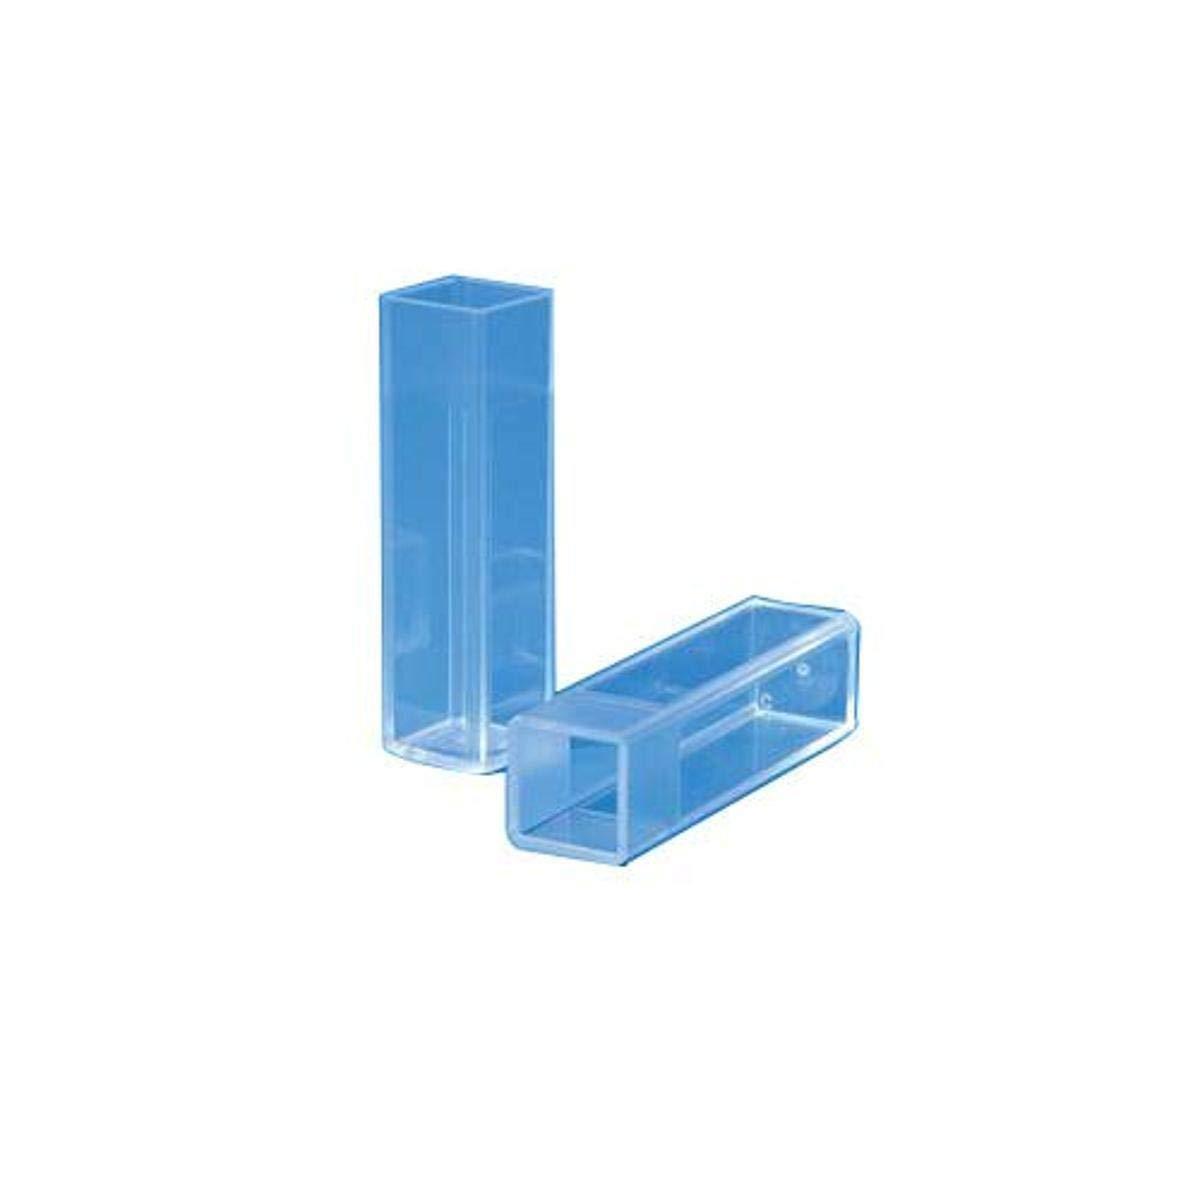 BRANDTECH SCIENTIFIC 759128 Ranking TOP18 Polypropylene Discount mail order Fluorescence UV Macro